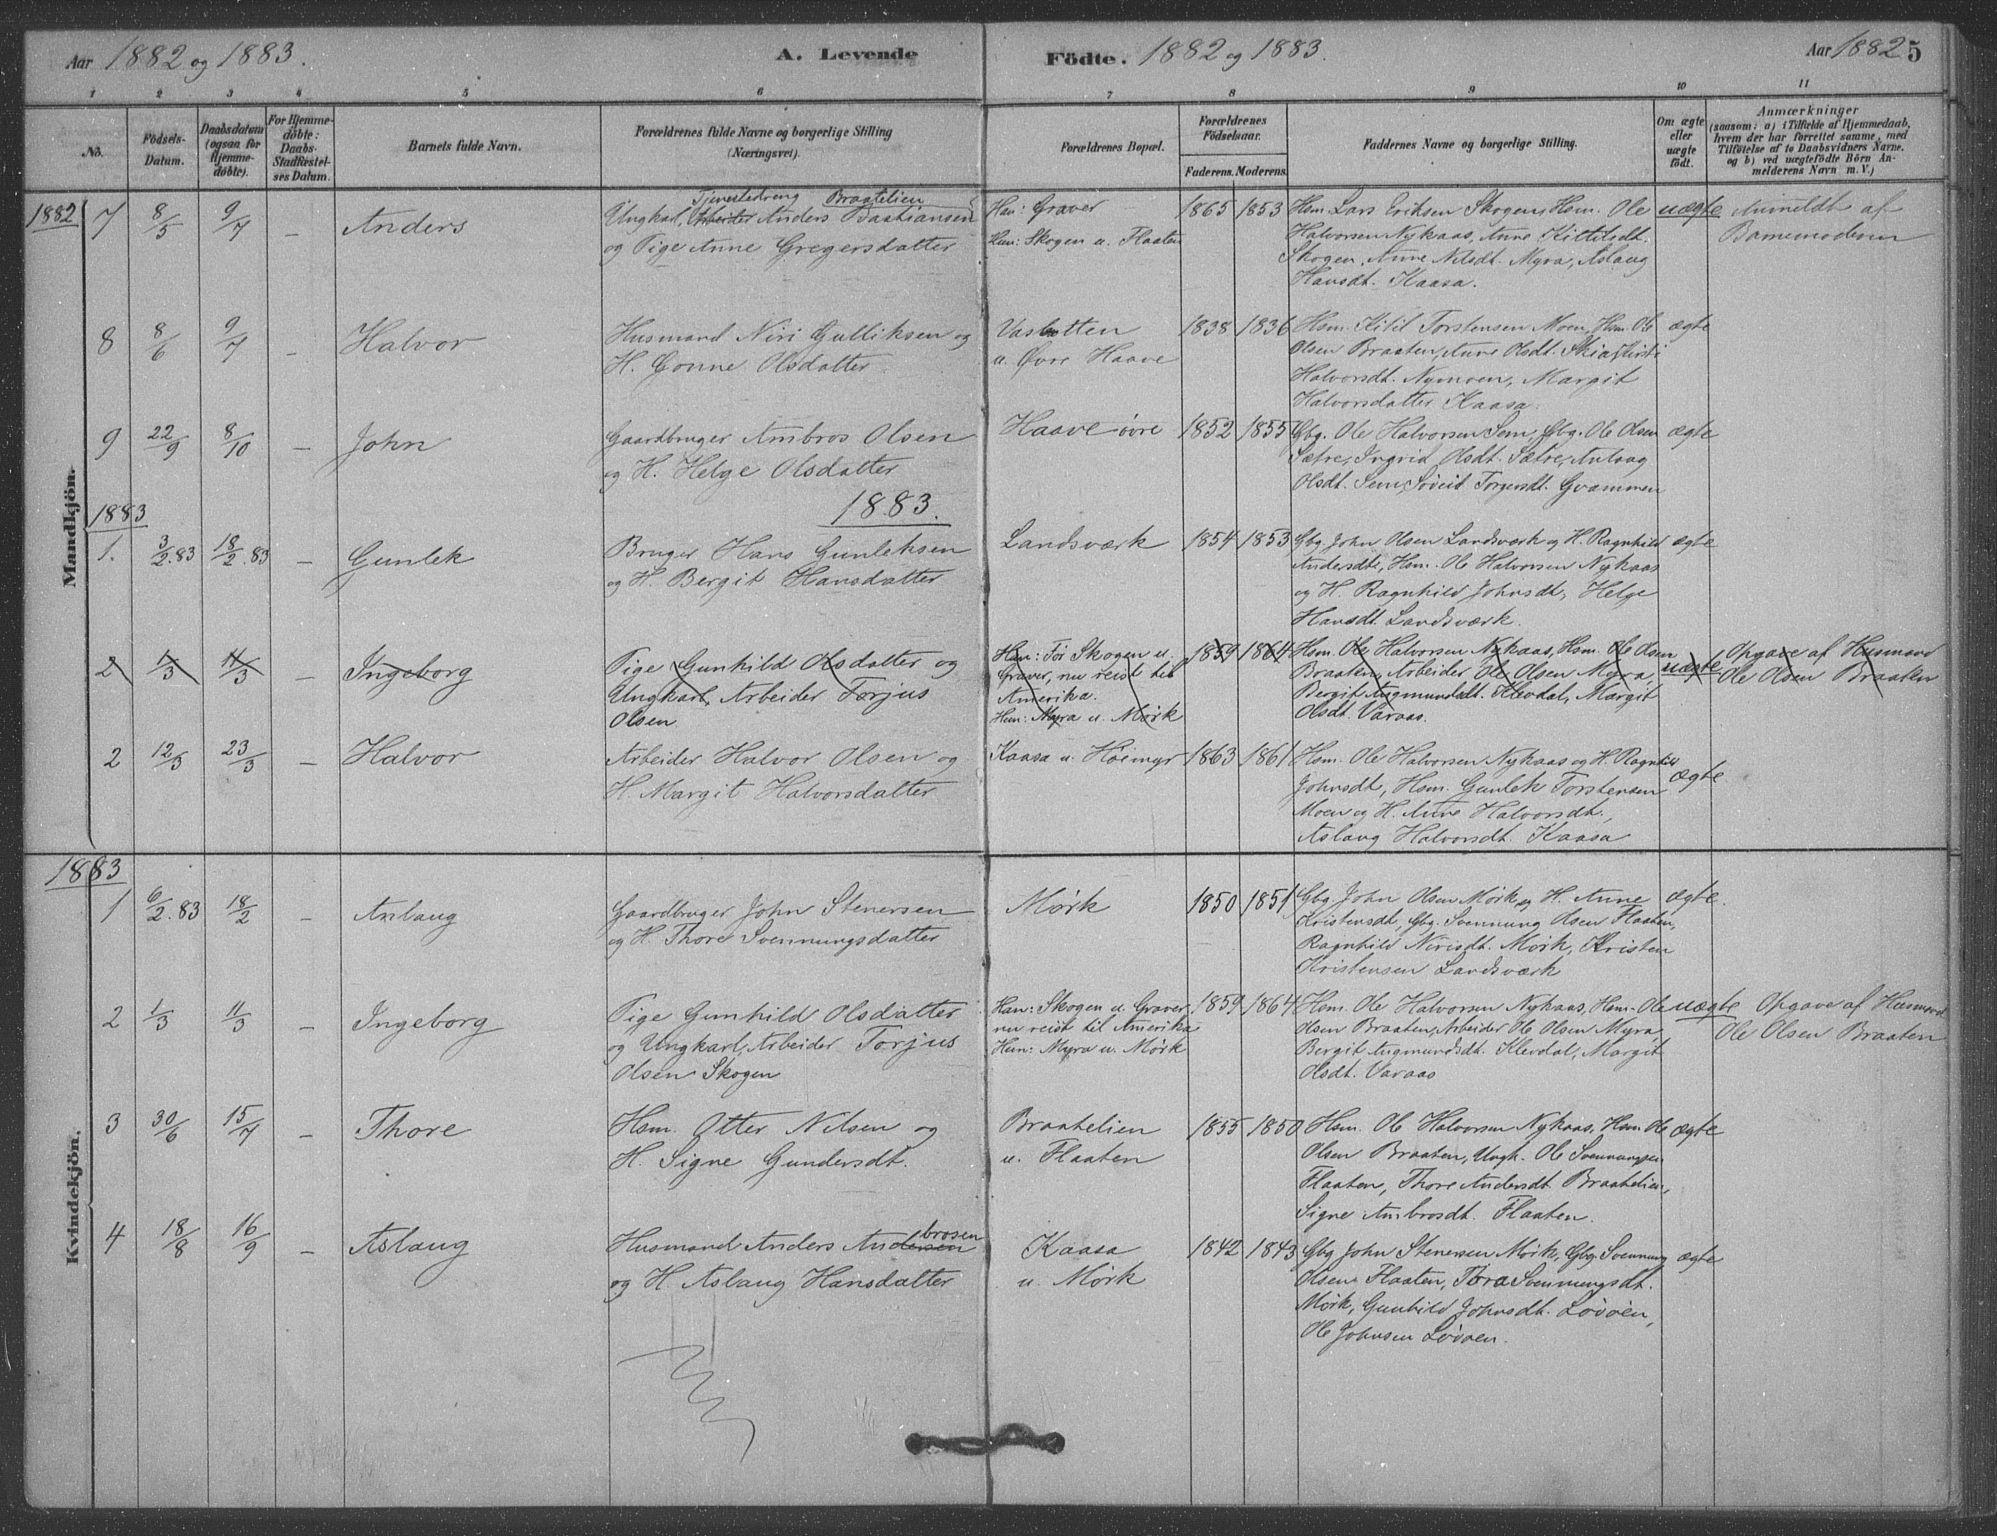 SAKO, Heddal kirkebøker, F/Fb/L0002: Ministerialbok nr. II 2, 1878-1913, s. 5